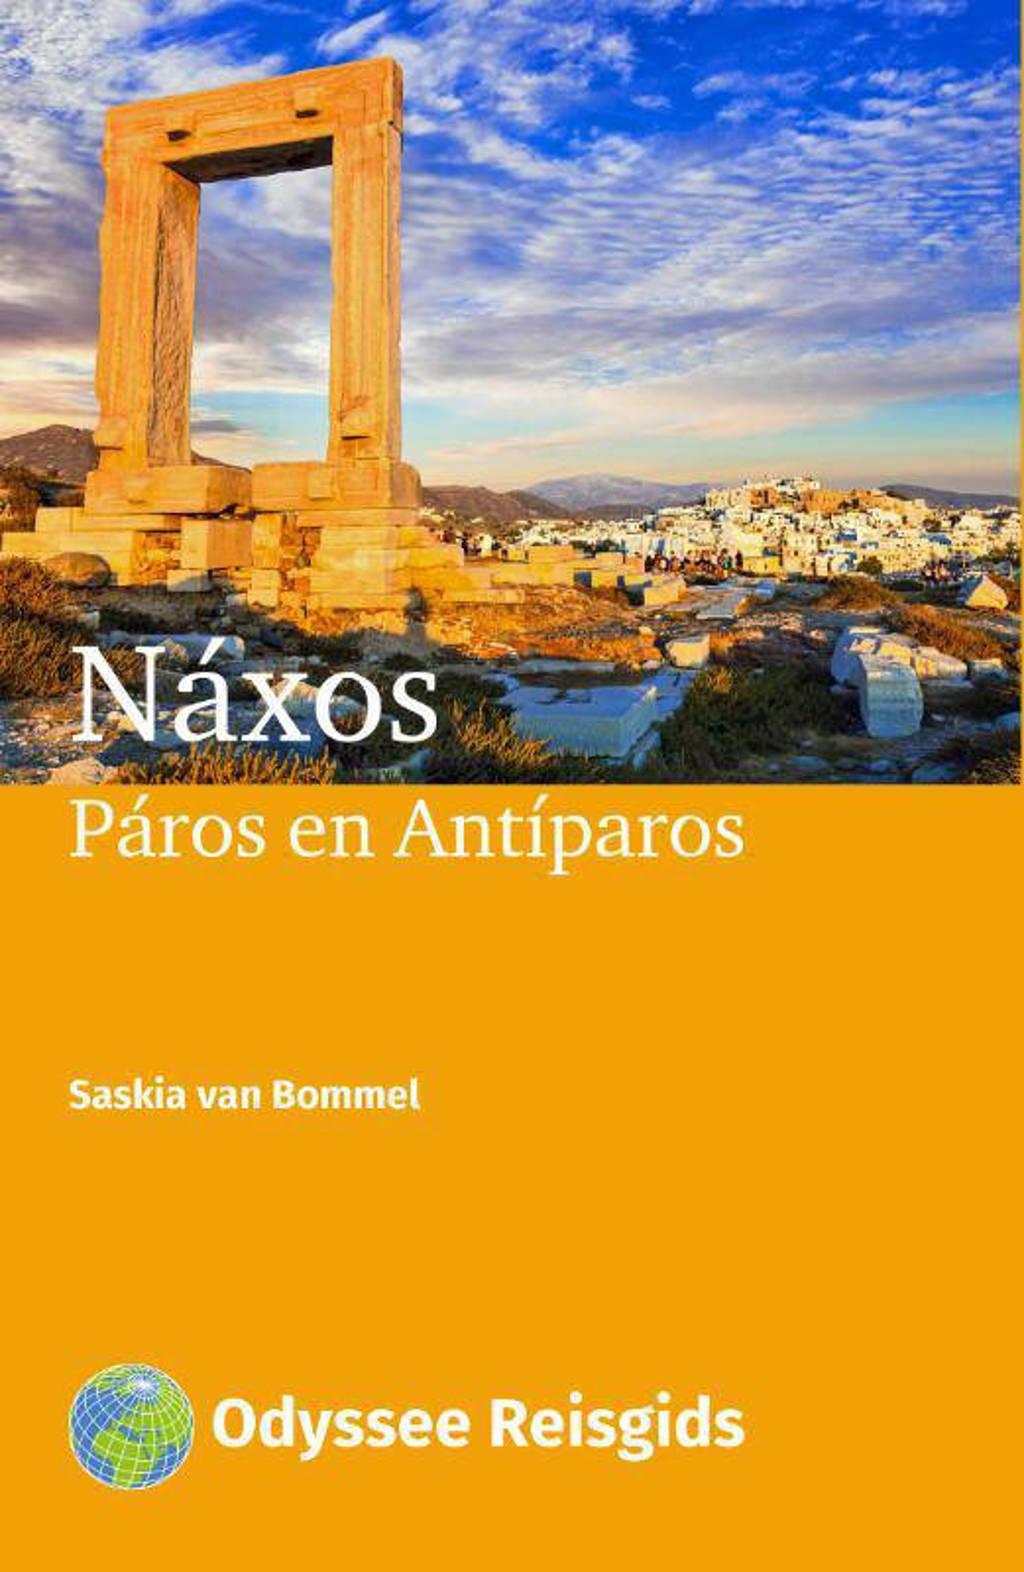 Odyssee Reisgidsen: Náxos, Páros en Antíparos - Saskia van Bommel